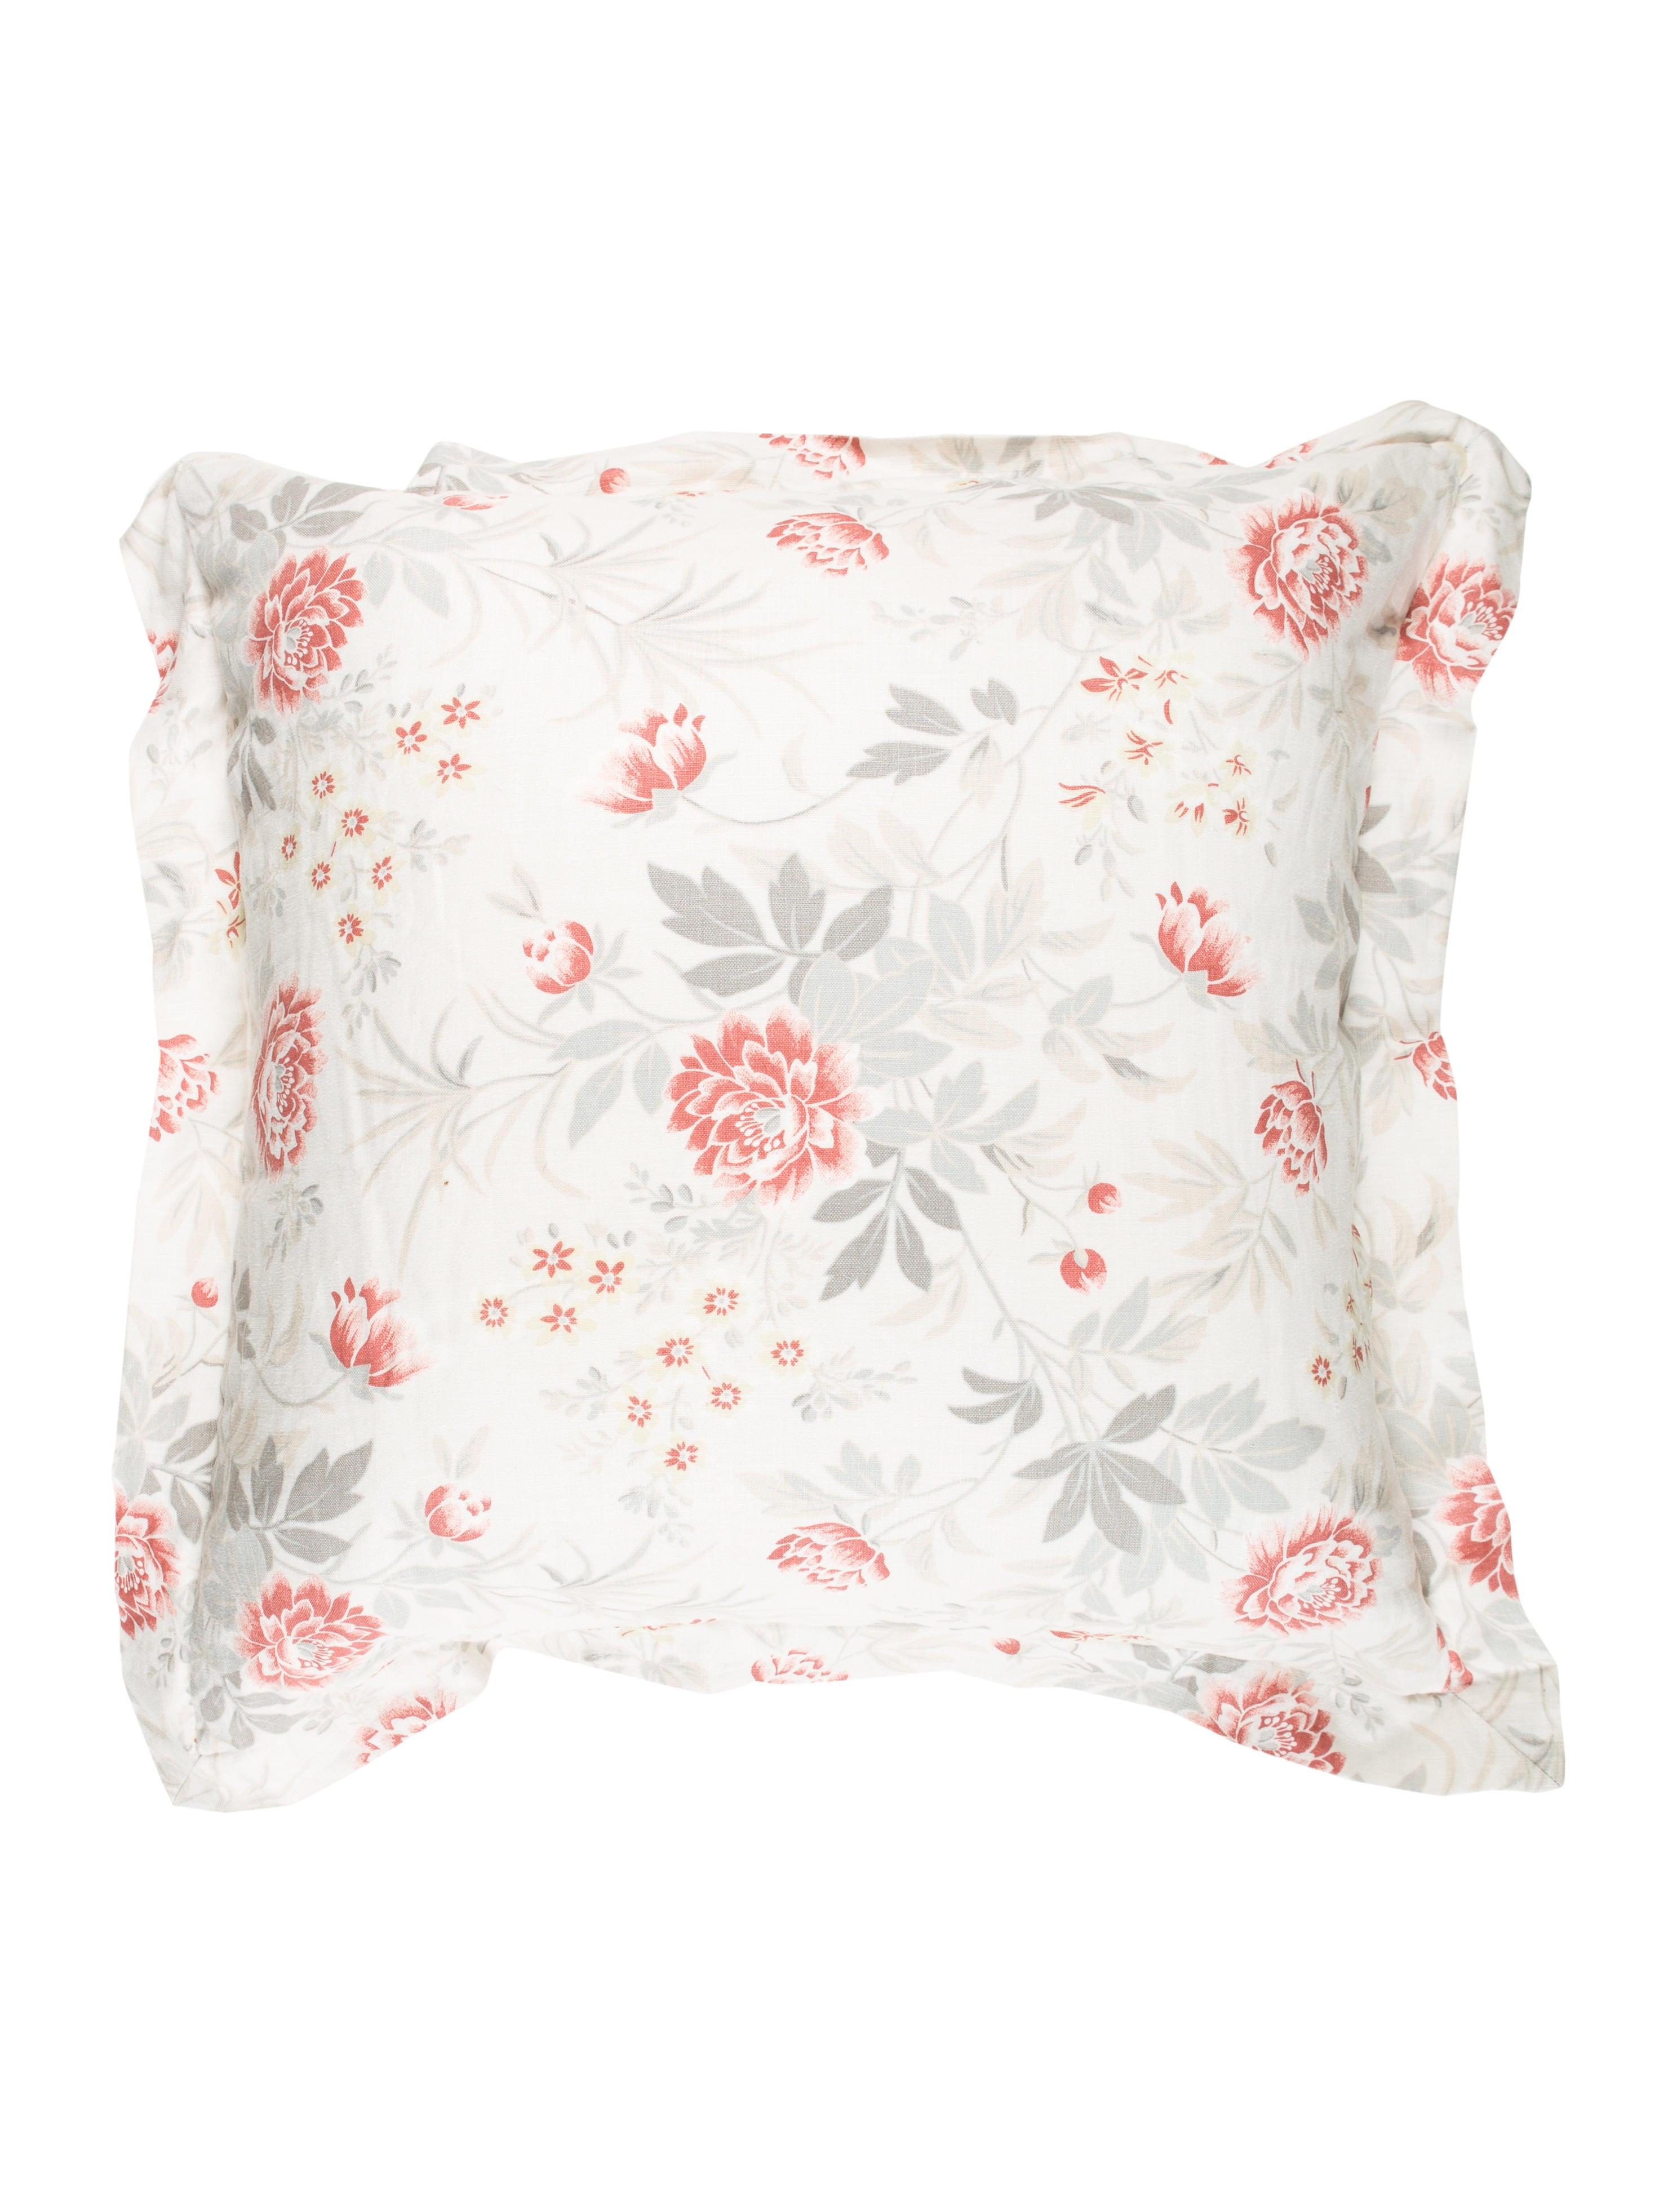 Home Linen Floral Throw Pillow - Bedding And Bath - HME21189 The RealReal